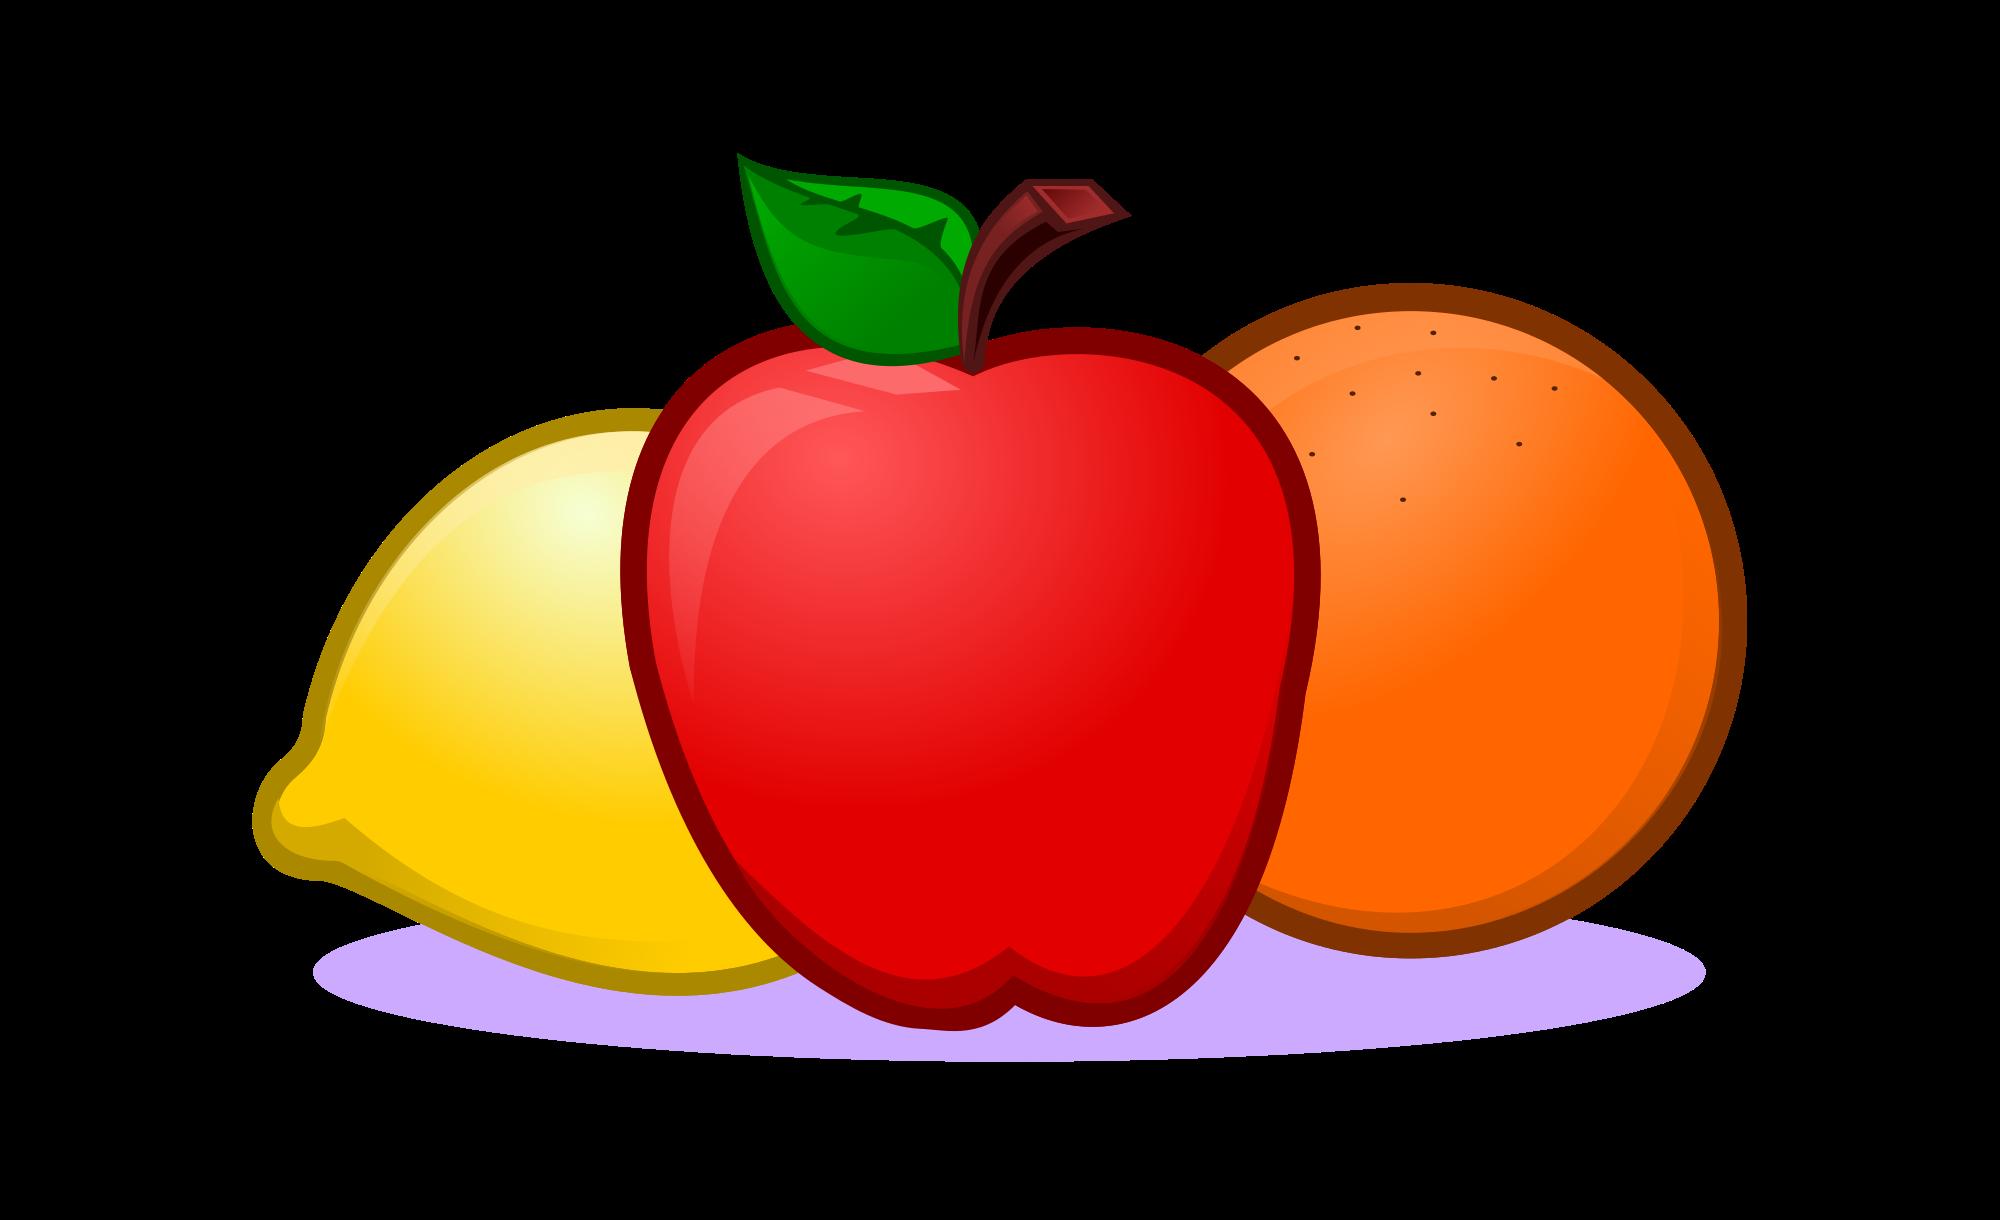 Fruit svg #17, Download drawings